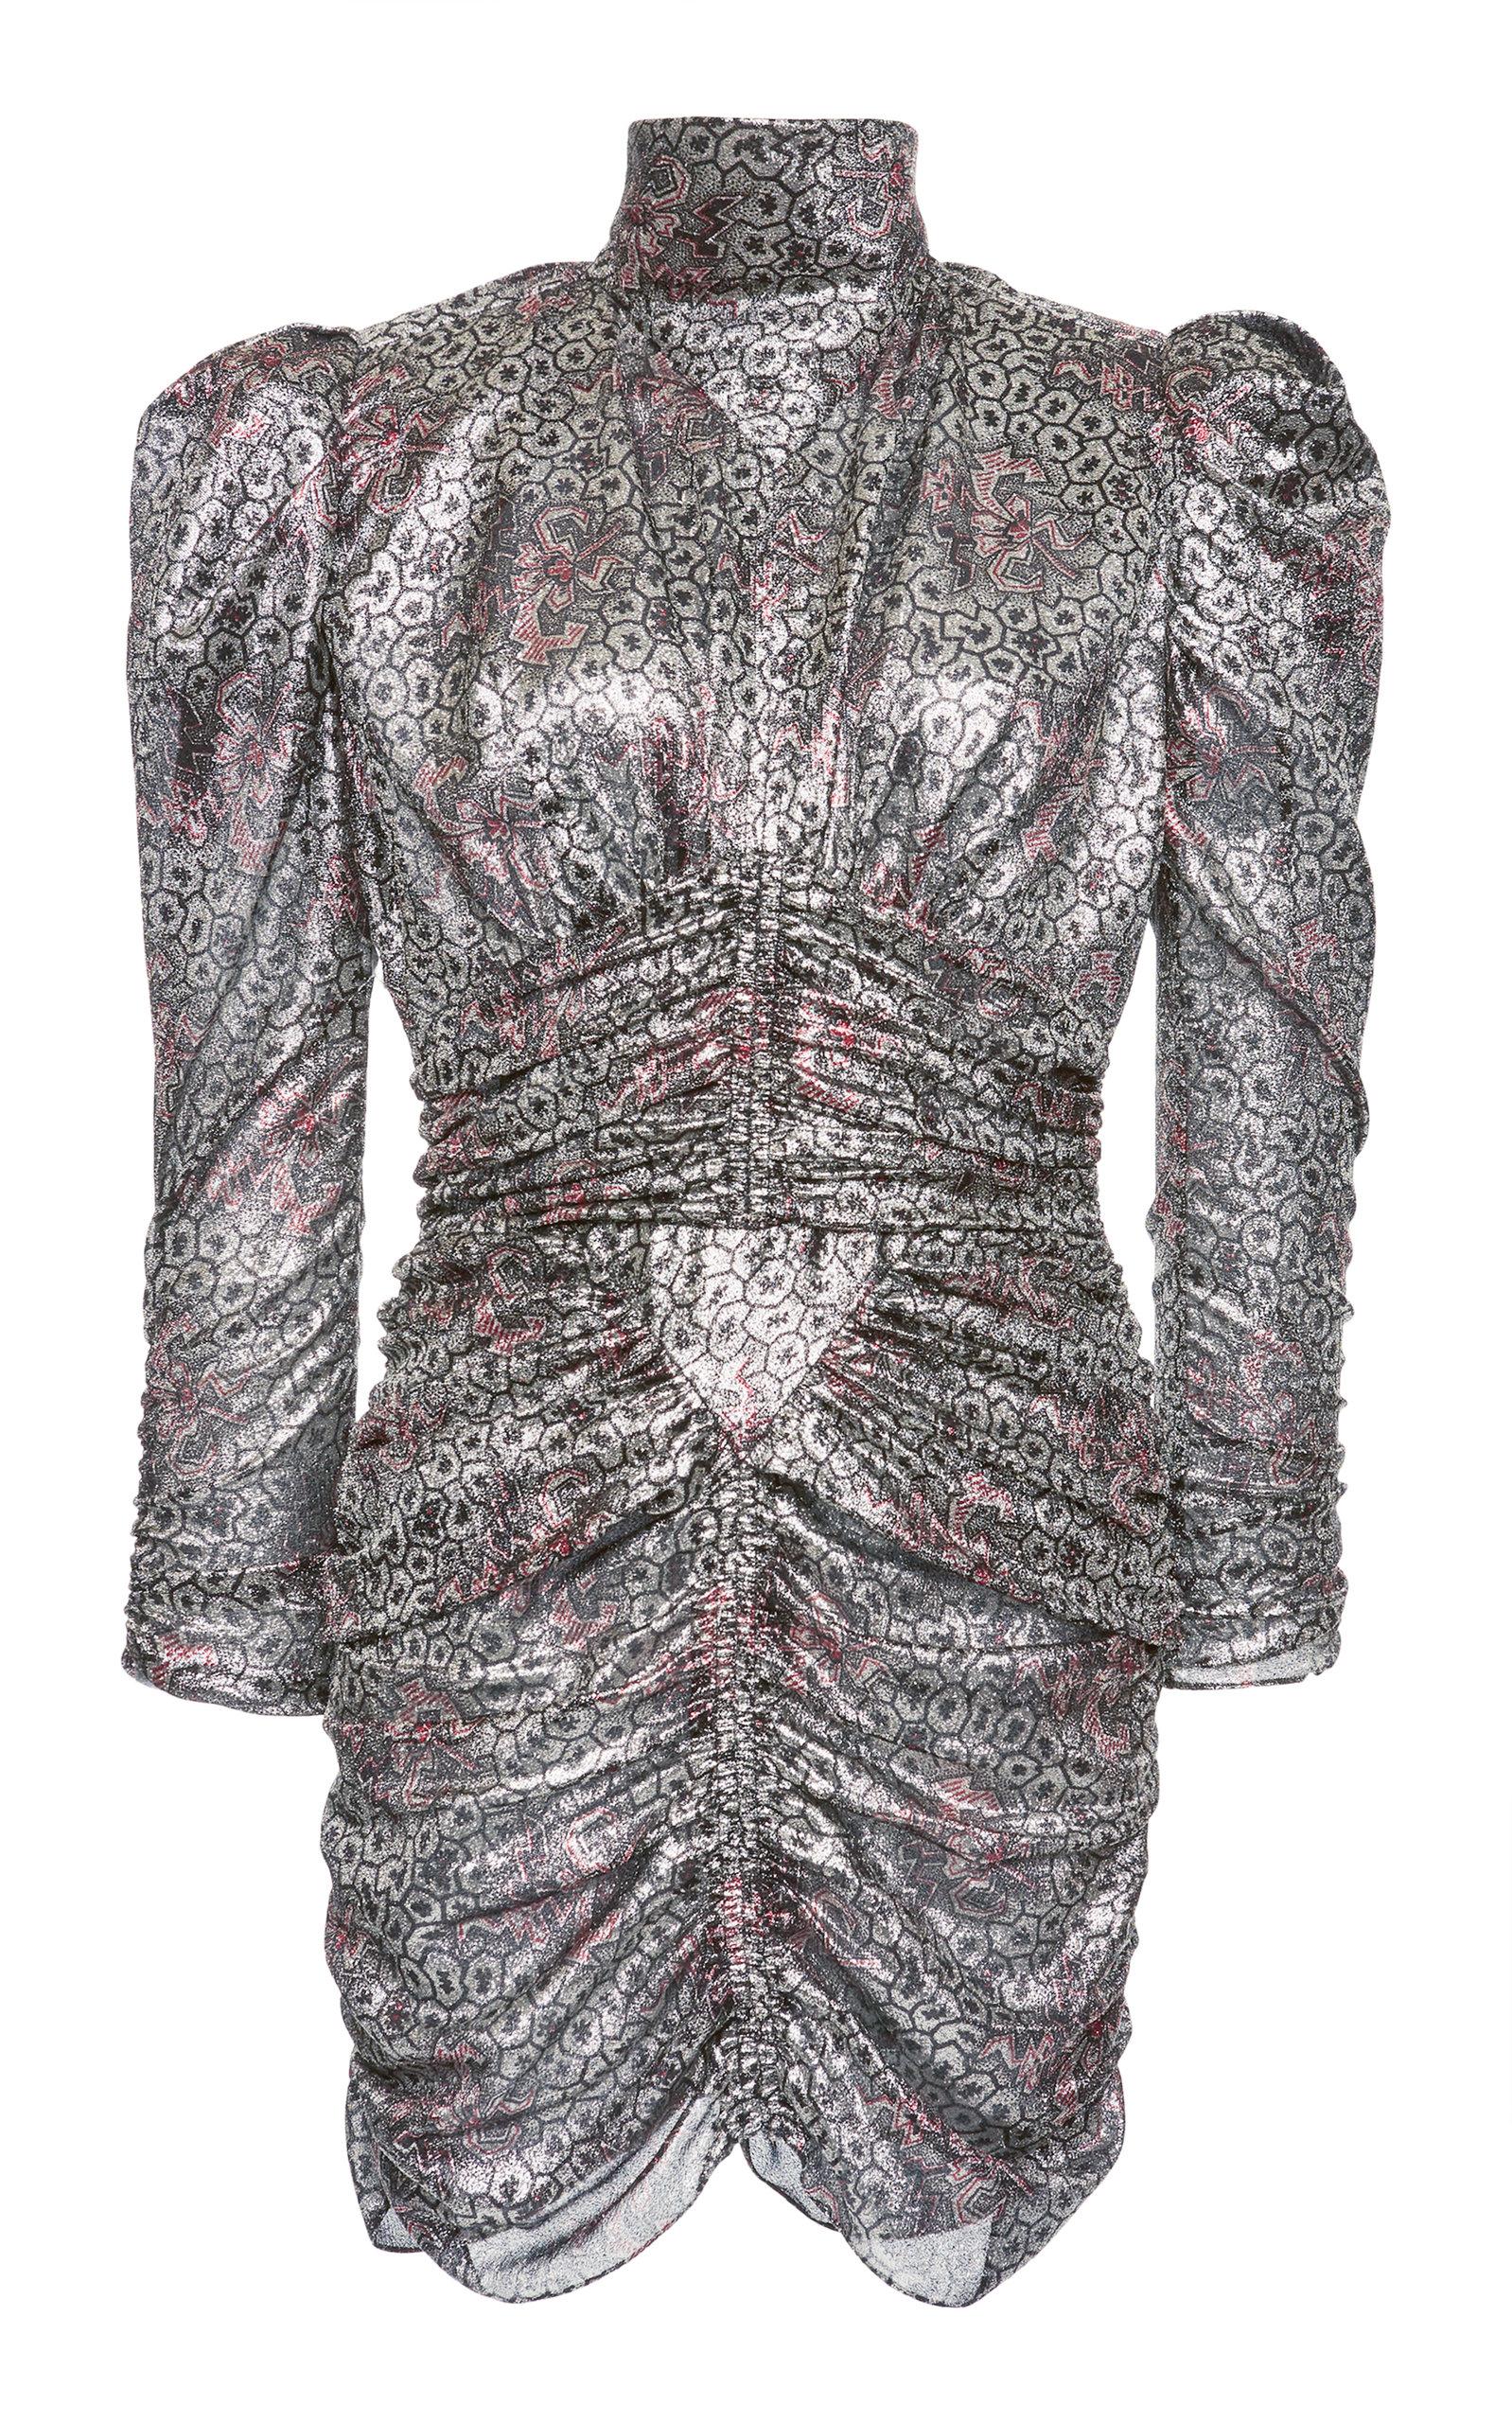 Pandor Ruched Printed Silk-Blend Lamé Mini Dress in Silver